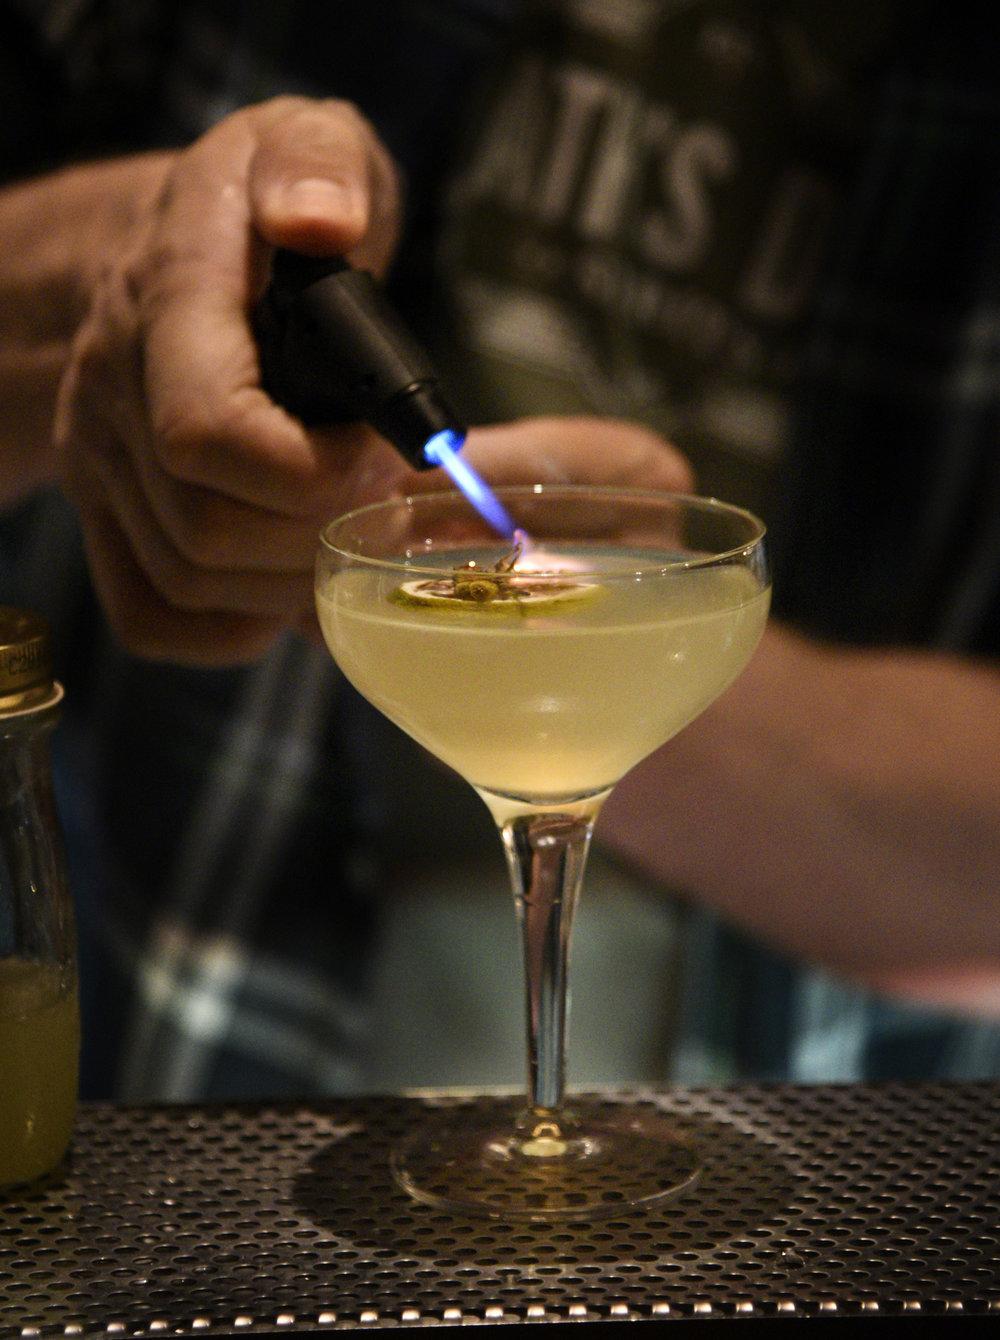 Solo Uno (Pier): 40 mL Hayman's Old Tom, 25 mL liquore Camomilla, 20 mL honey syrup,20 mL lemon juice, spoon Pimiento Dram --- shake and double strain